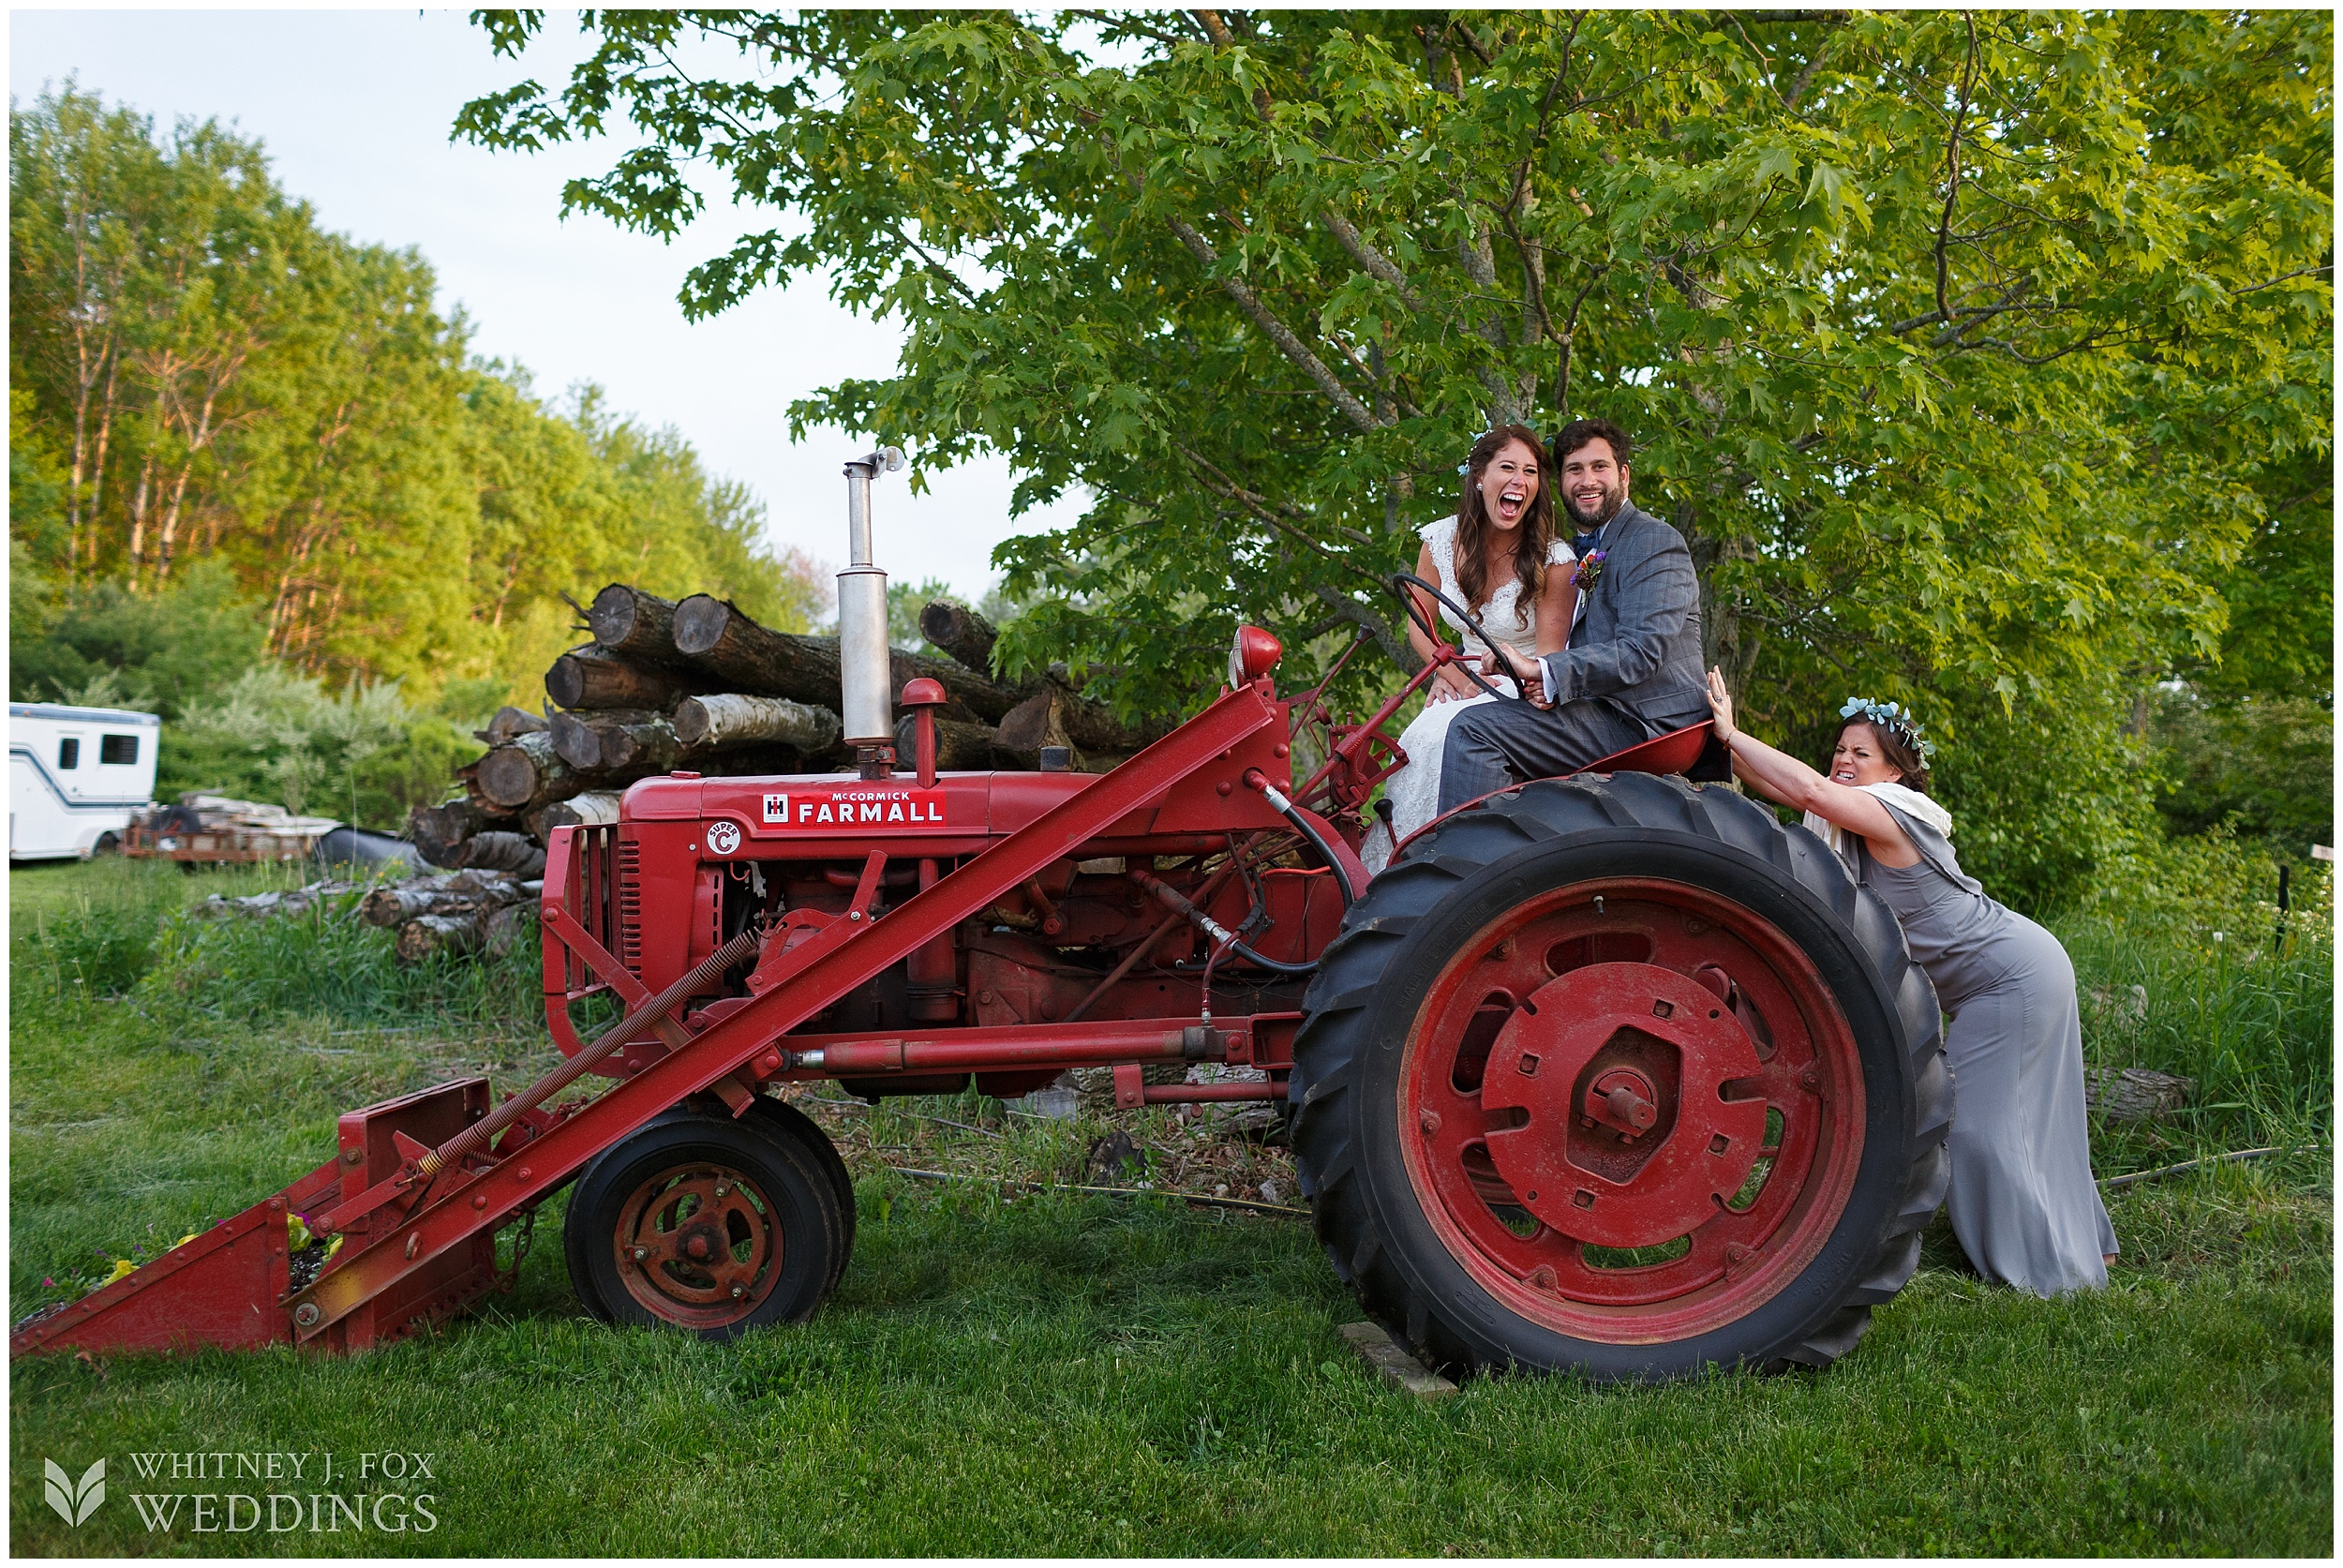 85_171_tai_josh_the_homestead_rest_be_thankful_farm_lyman_maine_photographer_whitney_j_fox_weddings_0523.jpg